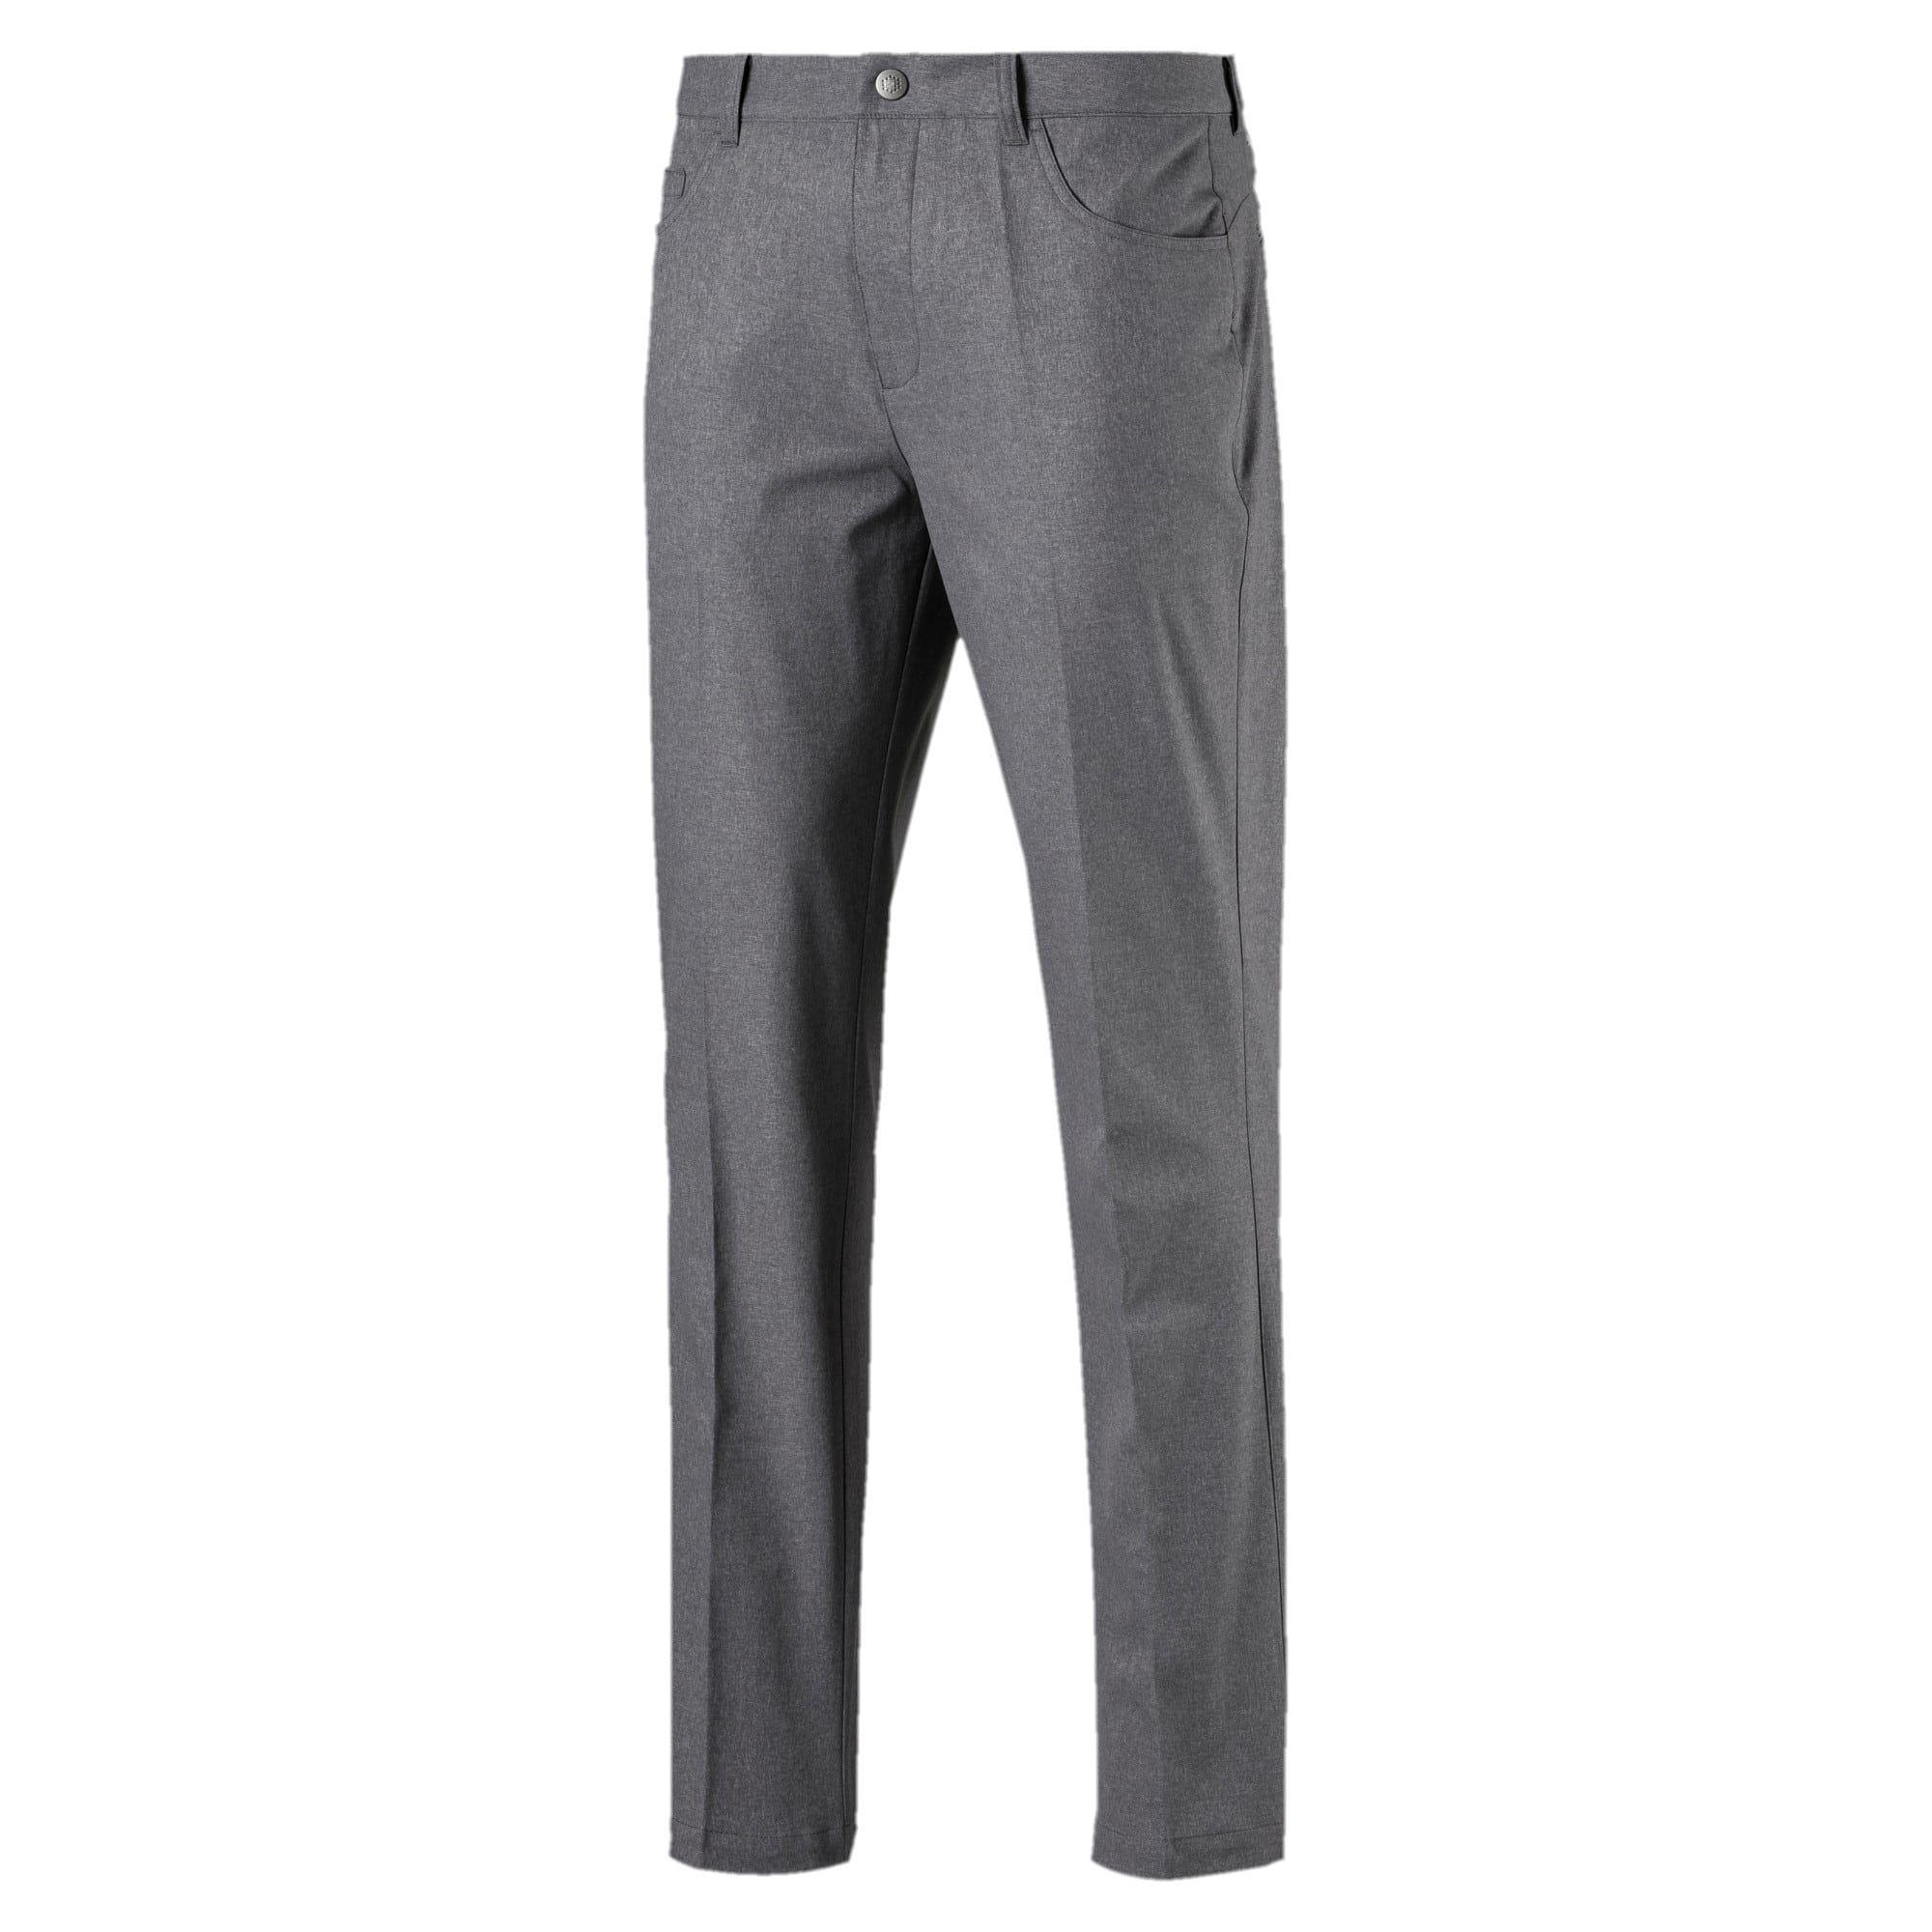 PUMA Jackpot 5 Pocket Heather Mens Golf Pants in Grey size 3336